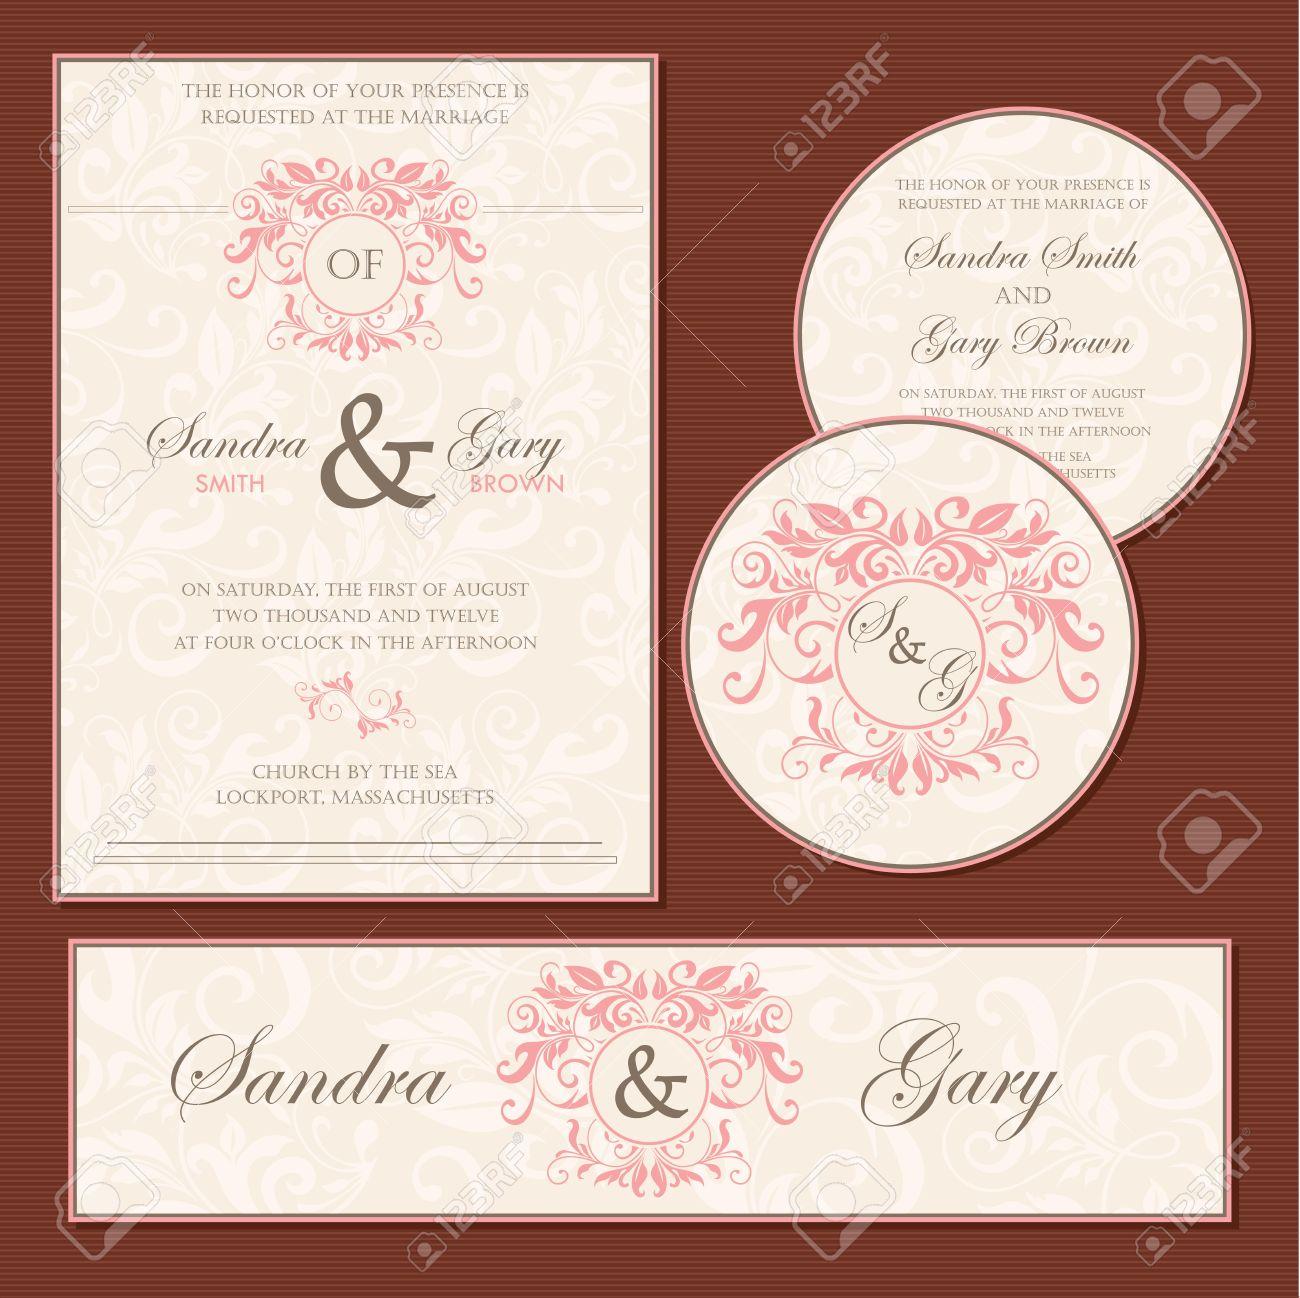 Set Of Wedding Invitation Cards Invitation Thank You Card – Wedding Stationery Thank You Cards